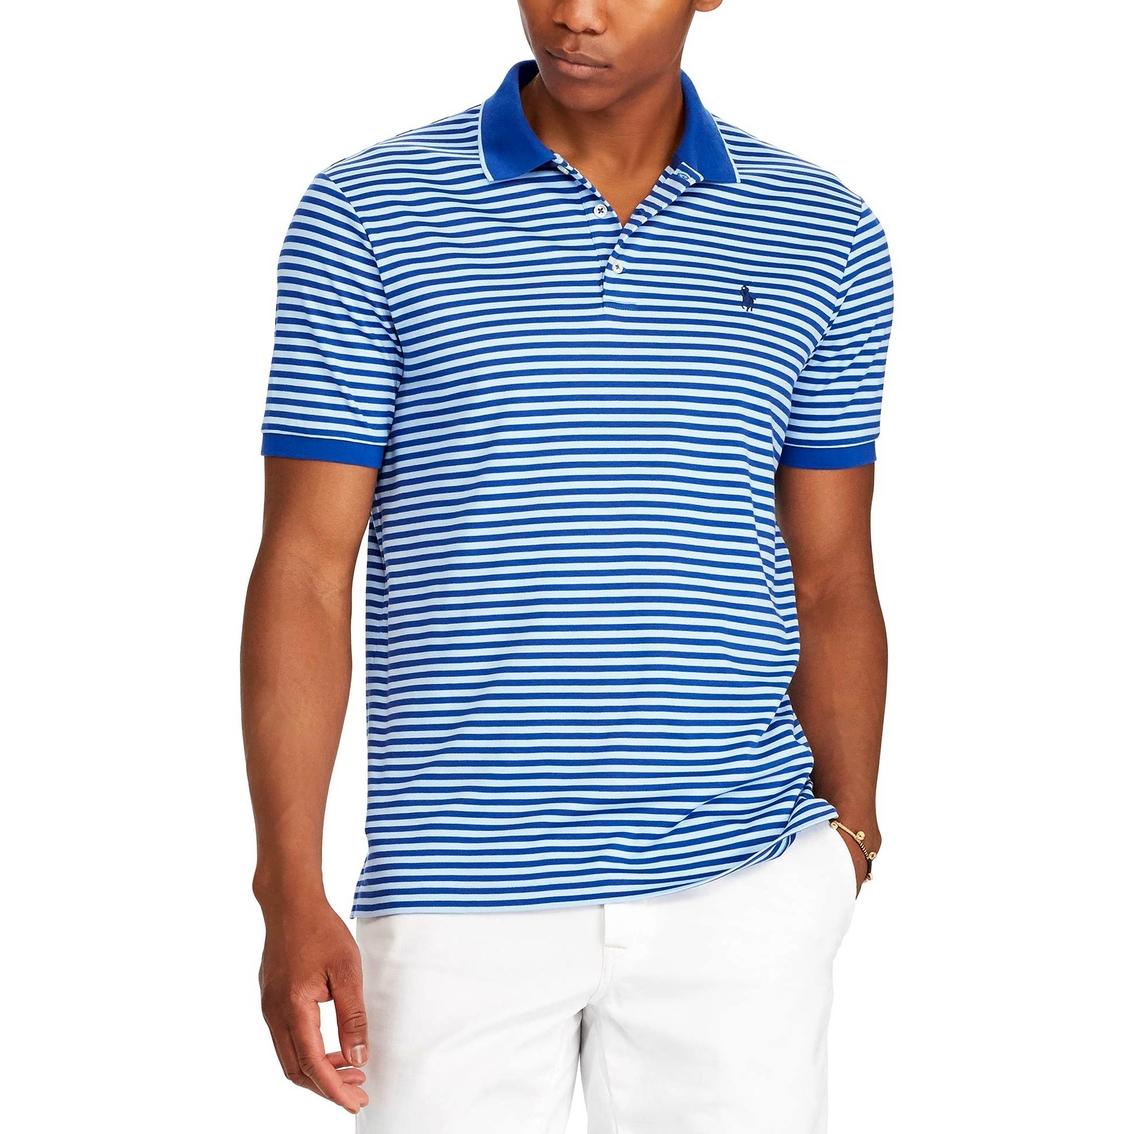 Polo Ralph Lauren Classic Fit Interlock Polo Shirt